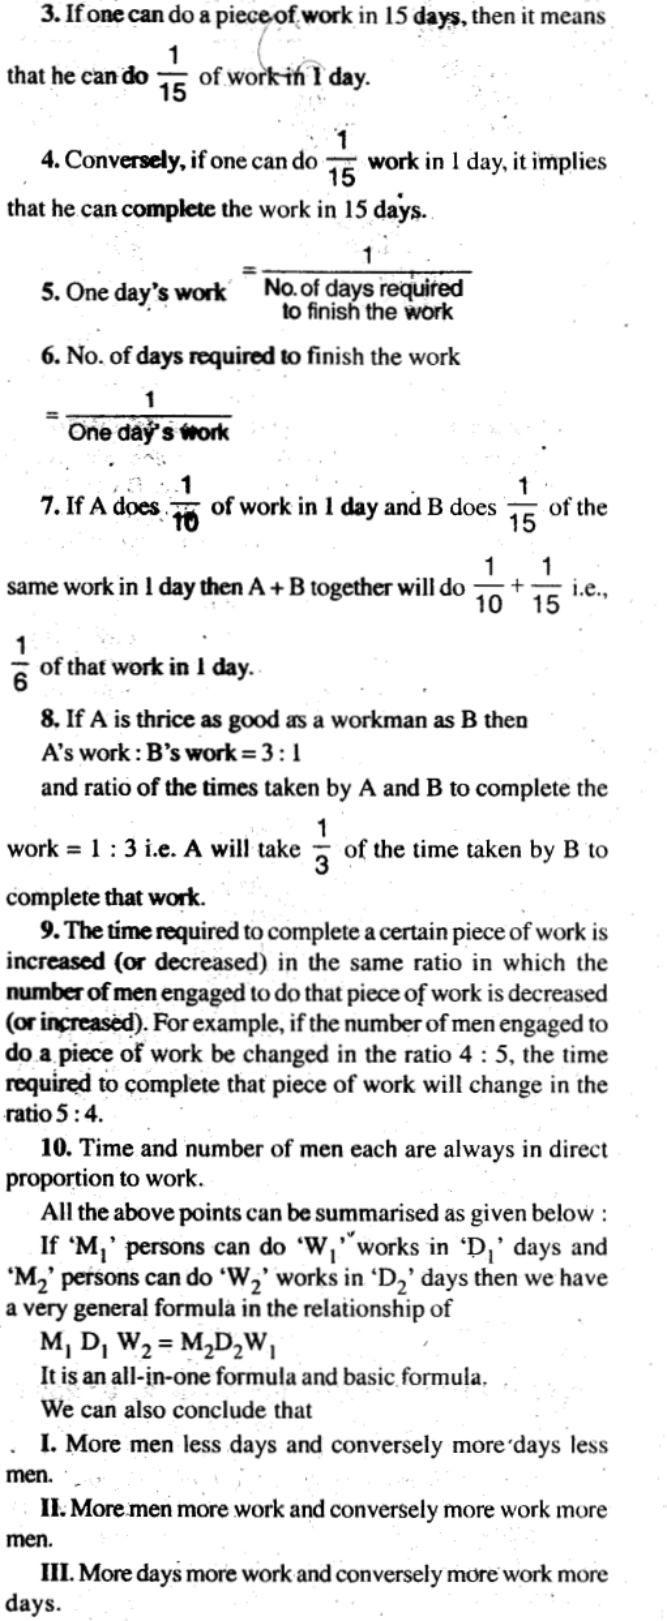 Quantitative Aptitude Time and Work Study Material. #Aptitude #QuantitativeAptitude #AptitudeAndReasoning #AptitudeTutorial #QuantitativeAptitudeTimeAndWork